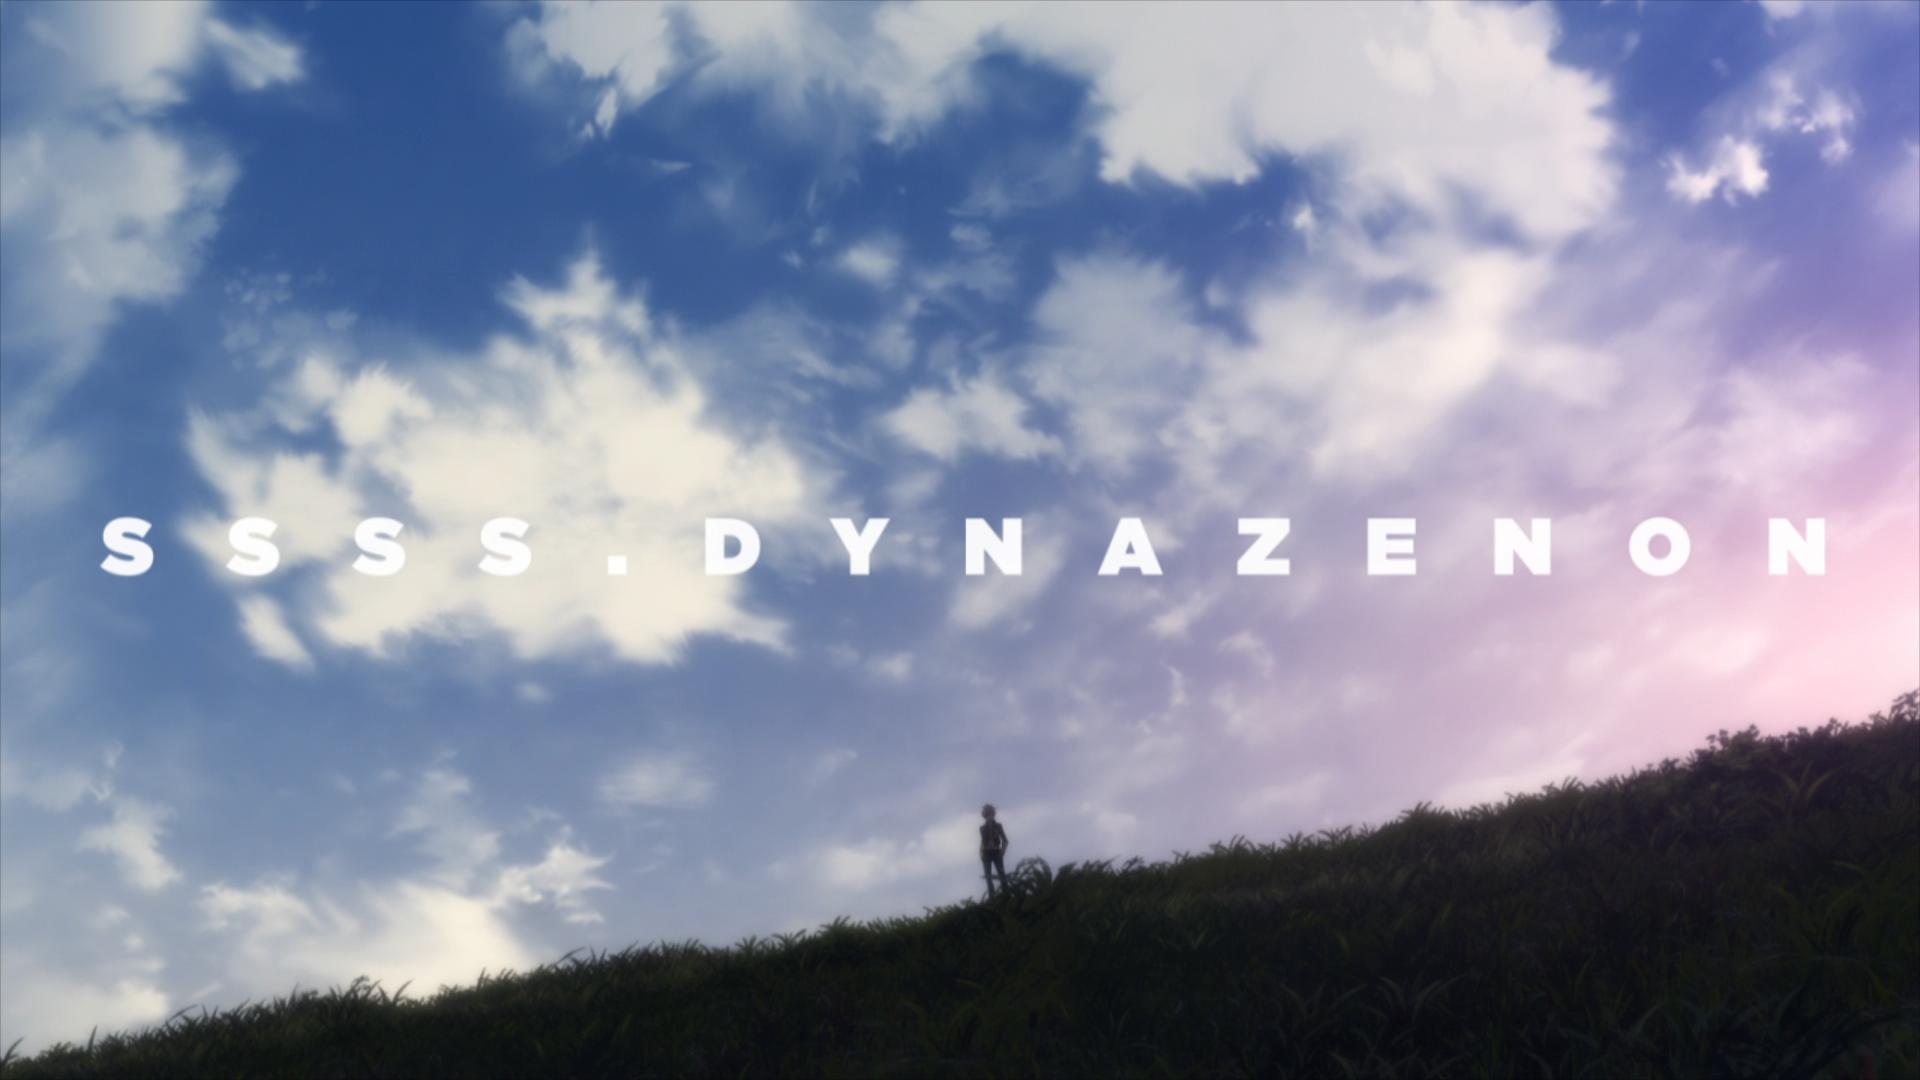 [Erai-raws] SSSS.Dynazenon - 01 [v0][1080p][Multiple Subtitle].mkv_snapshot_01.23